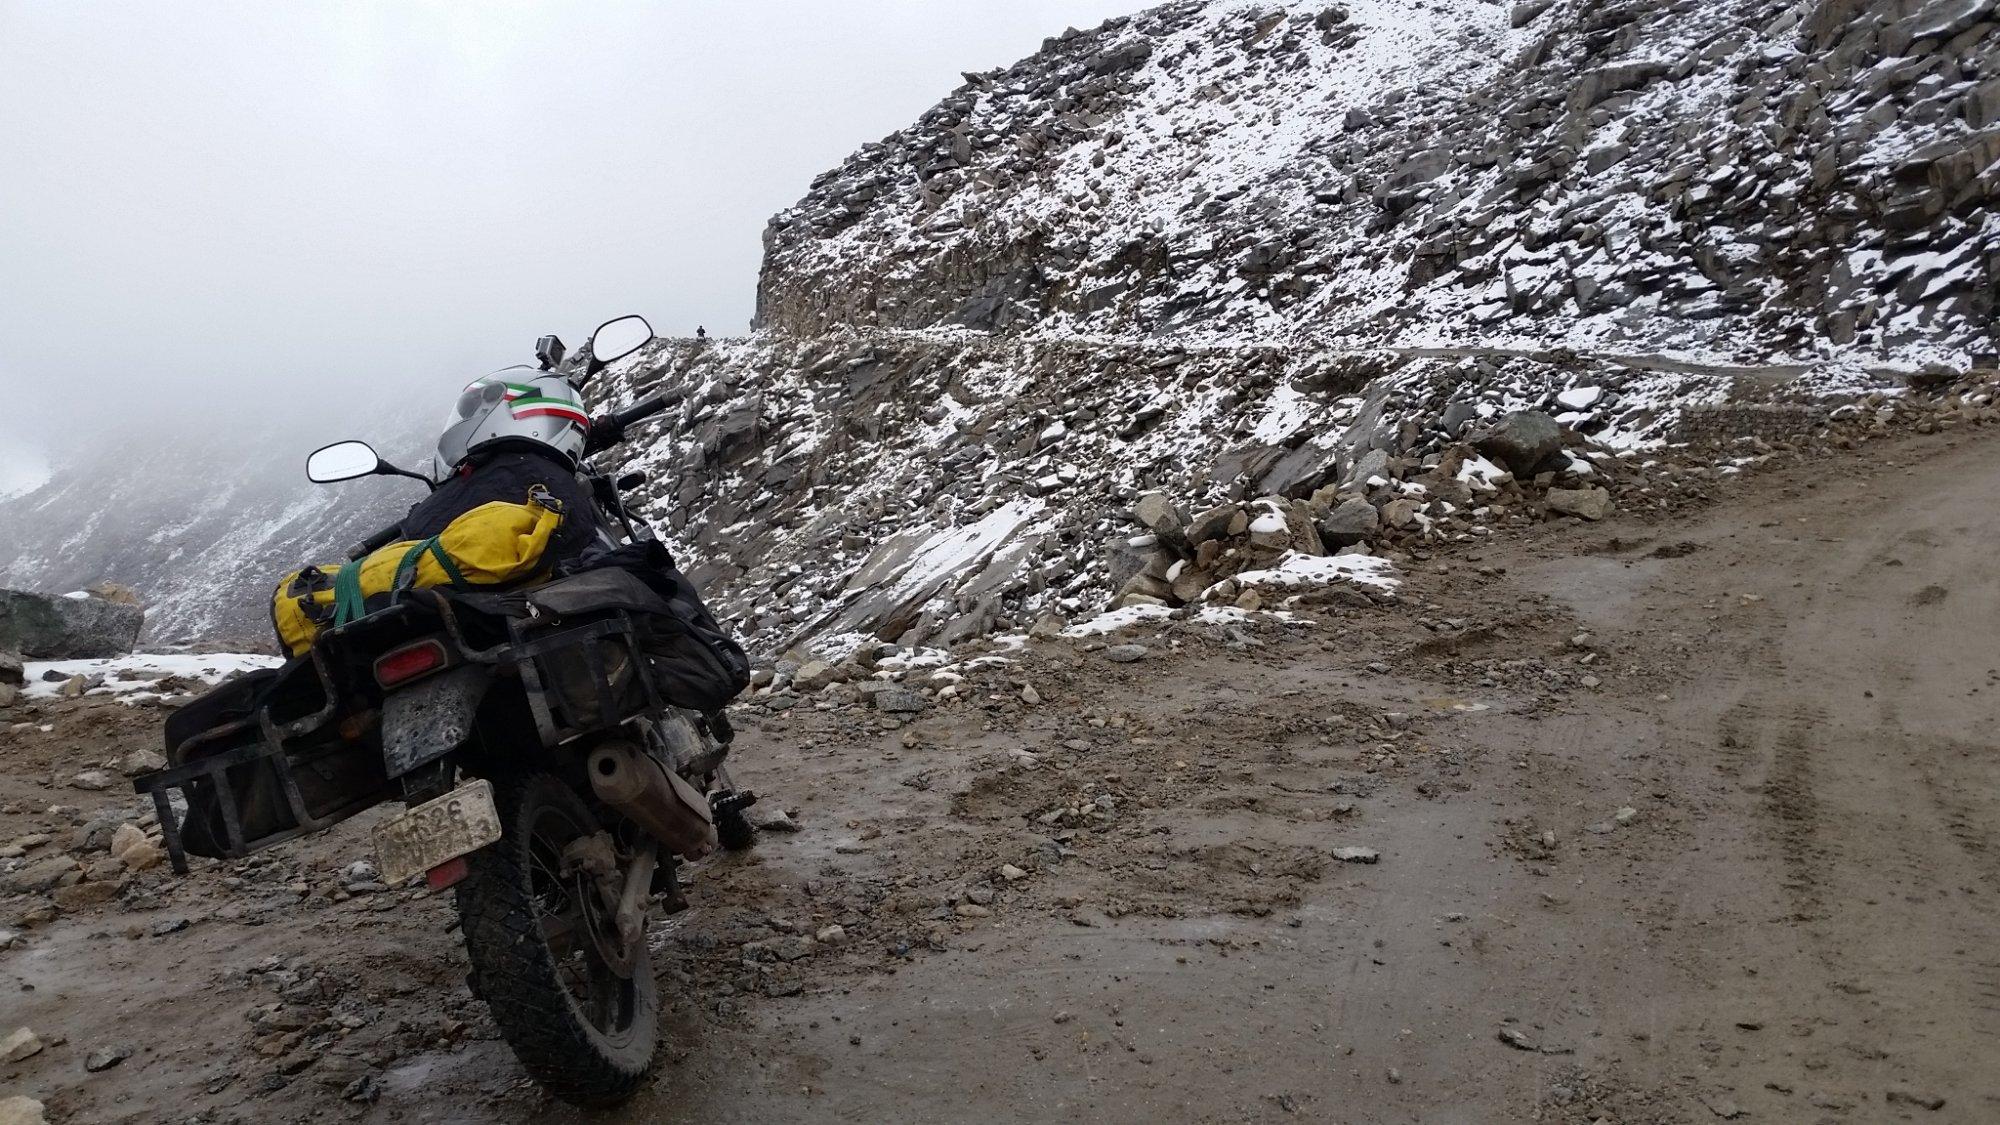 2018-09-08 Riding to Khardungla Pass again 03.jpg